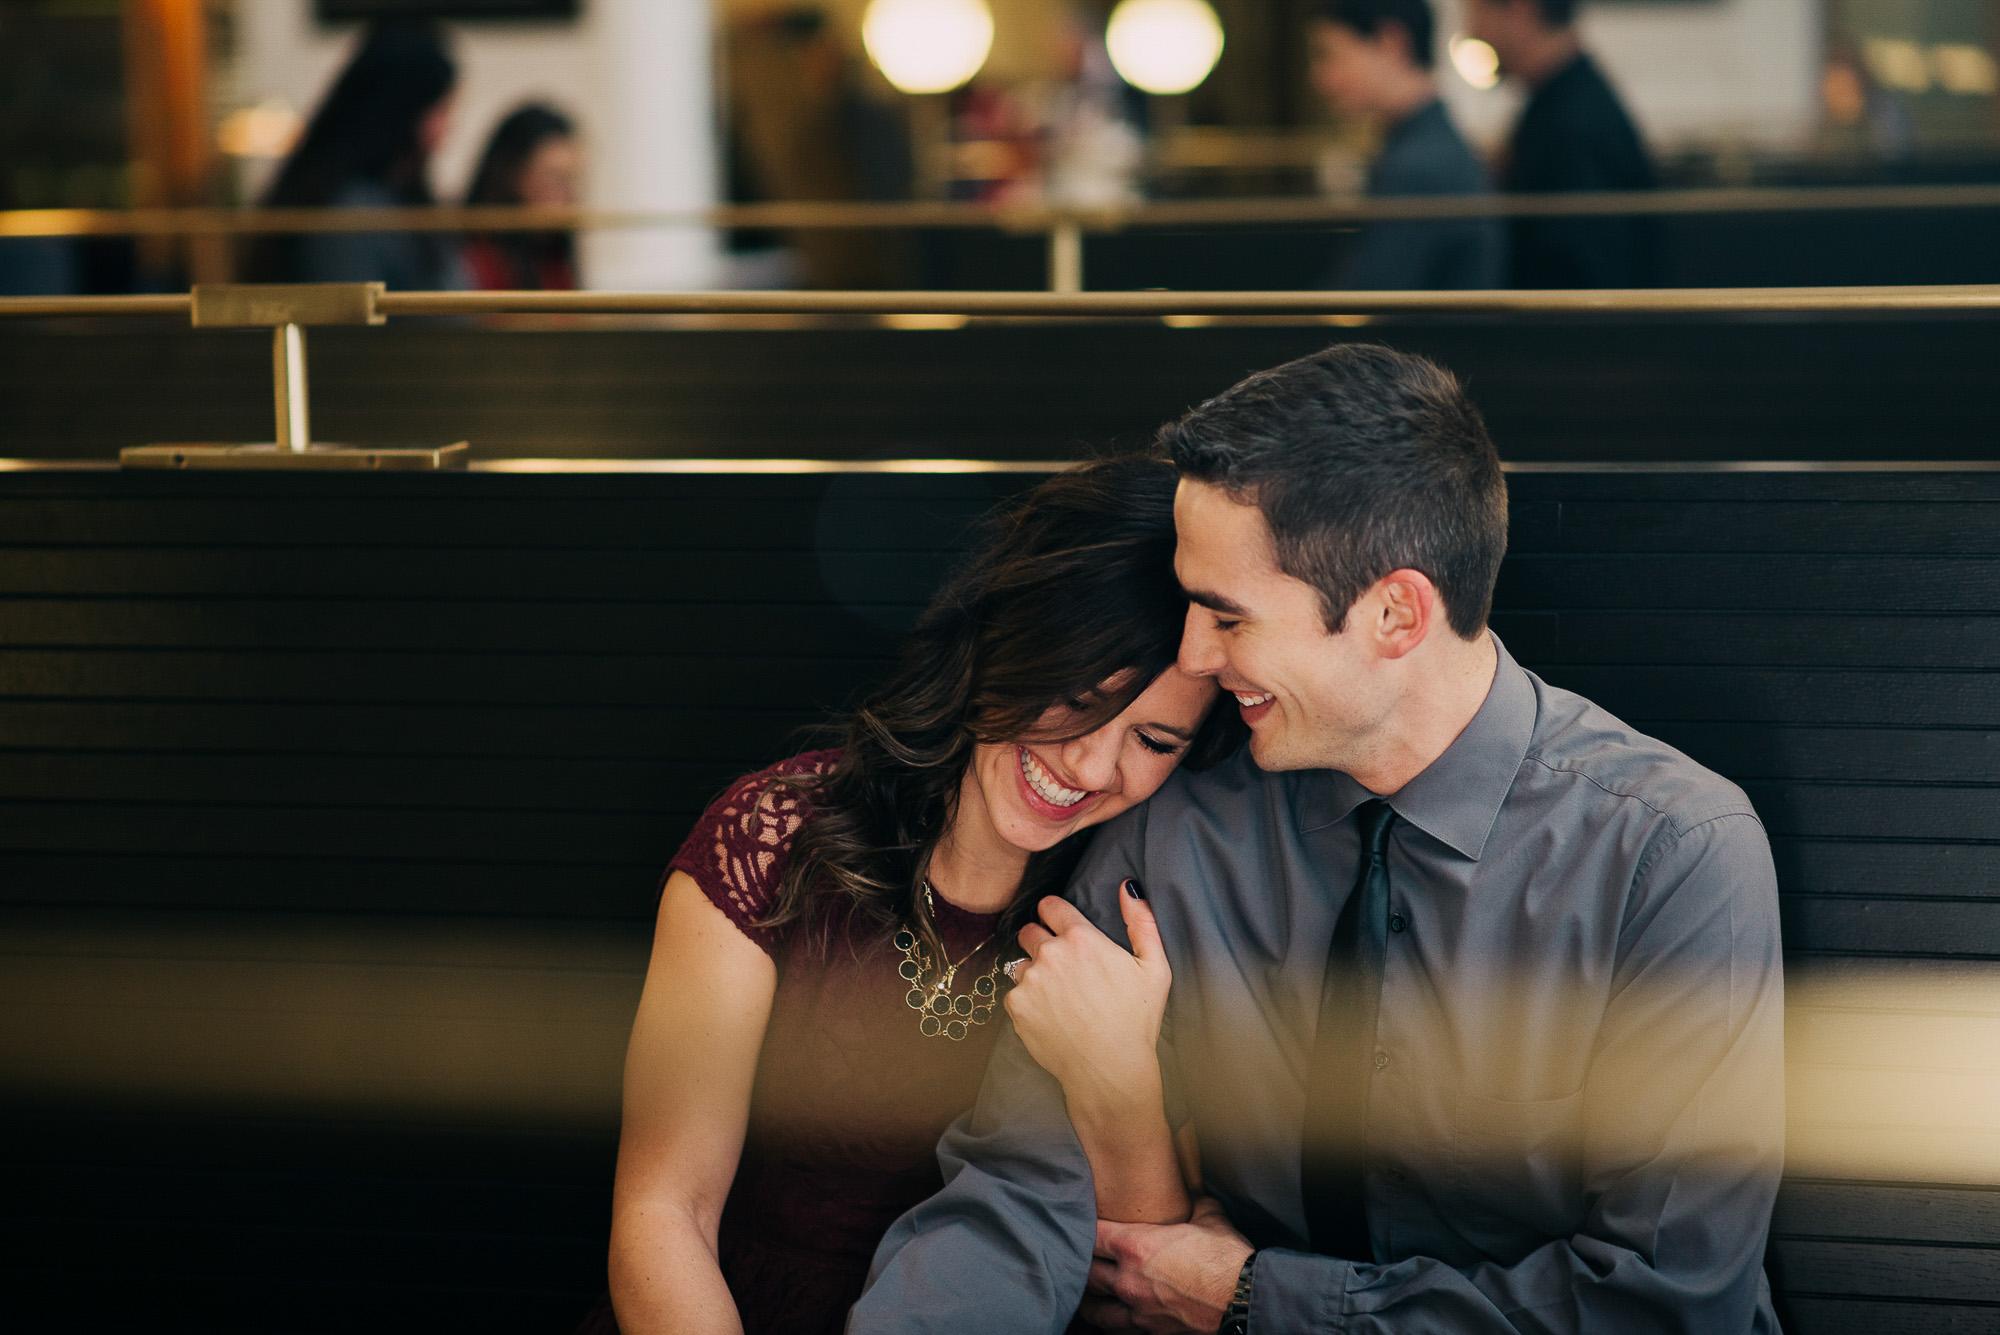 77-06couple-anniversary-engagement-photographer-colorado-denver_wedding_photographer_photo_courtney&kirby_eng_656_vintage.jpg